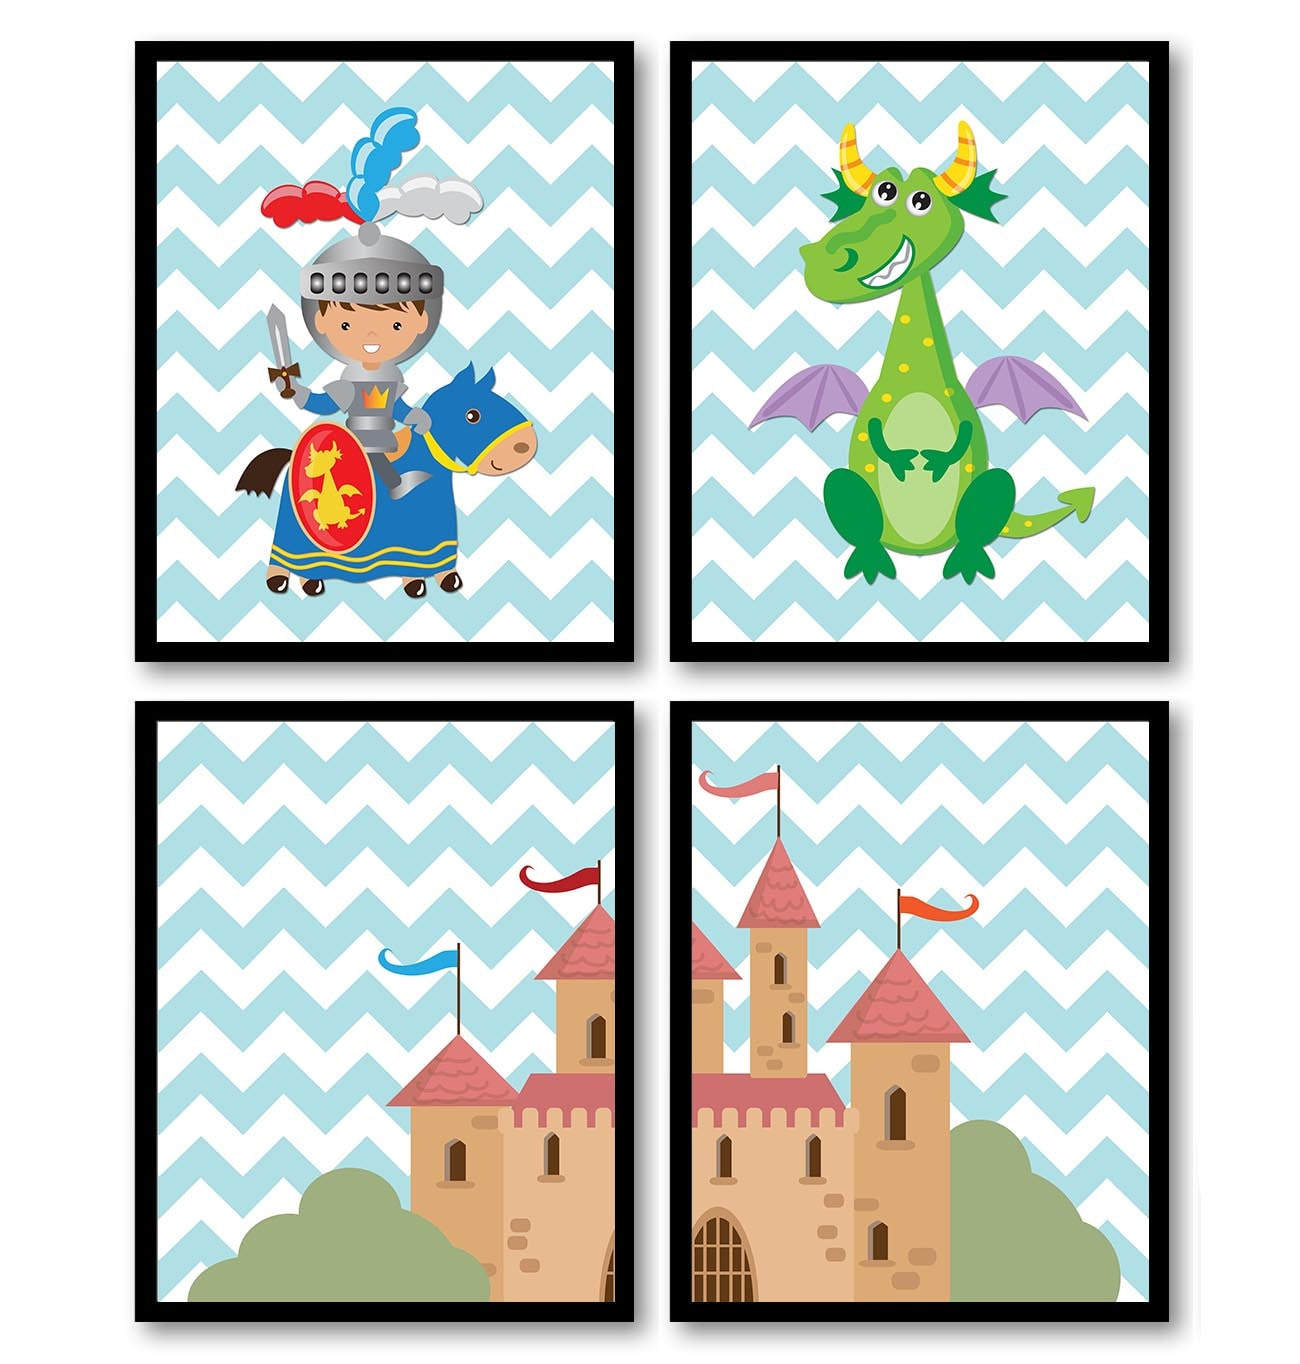 Fairy Tale Nursery Art Child Baby Set of 4 Art Prints Blue Chevron Boy Knight Dragon Castle Kids Roo